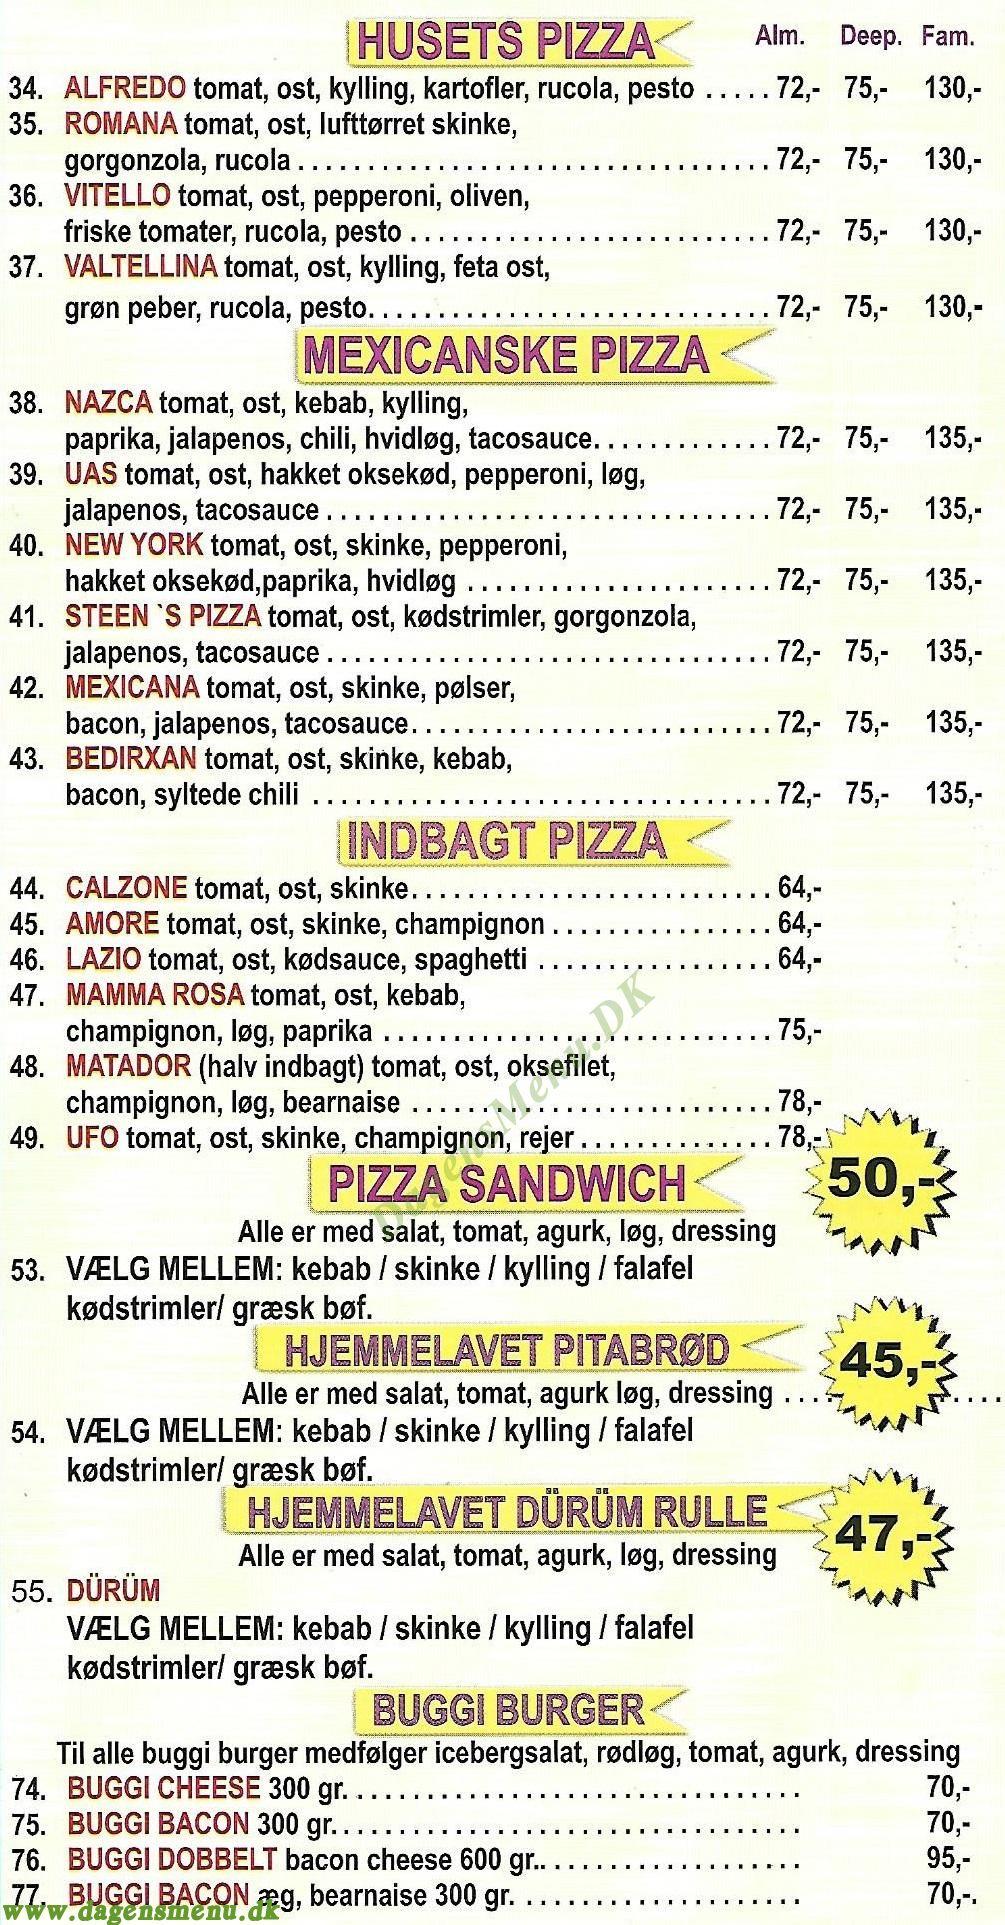 Buddinge Pizza - Menukort